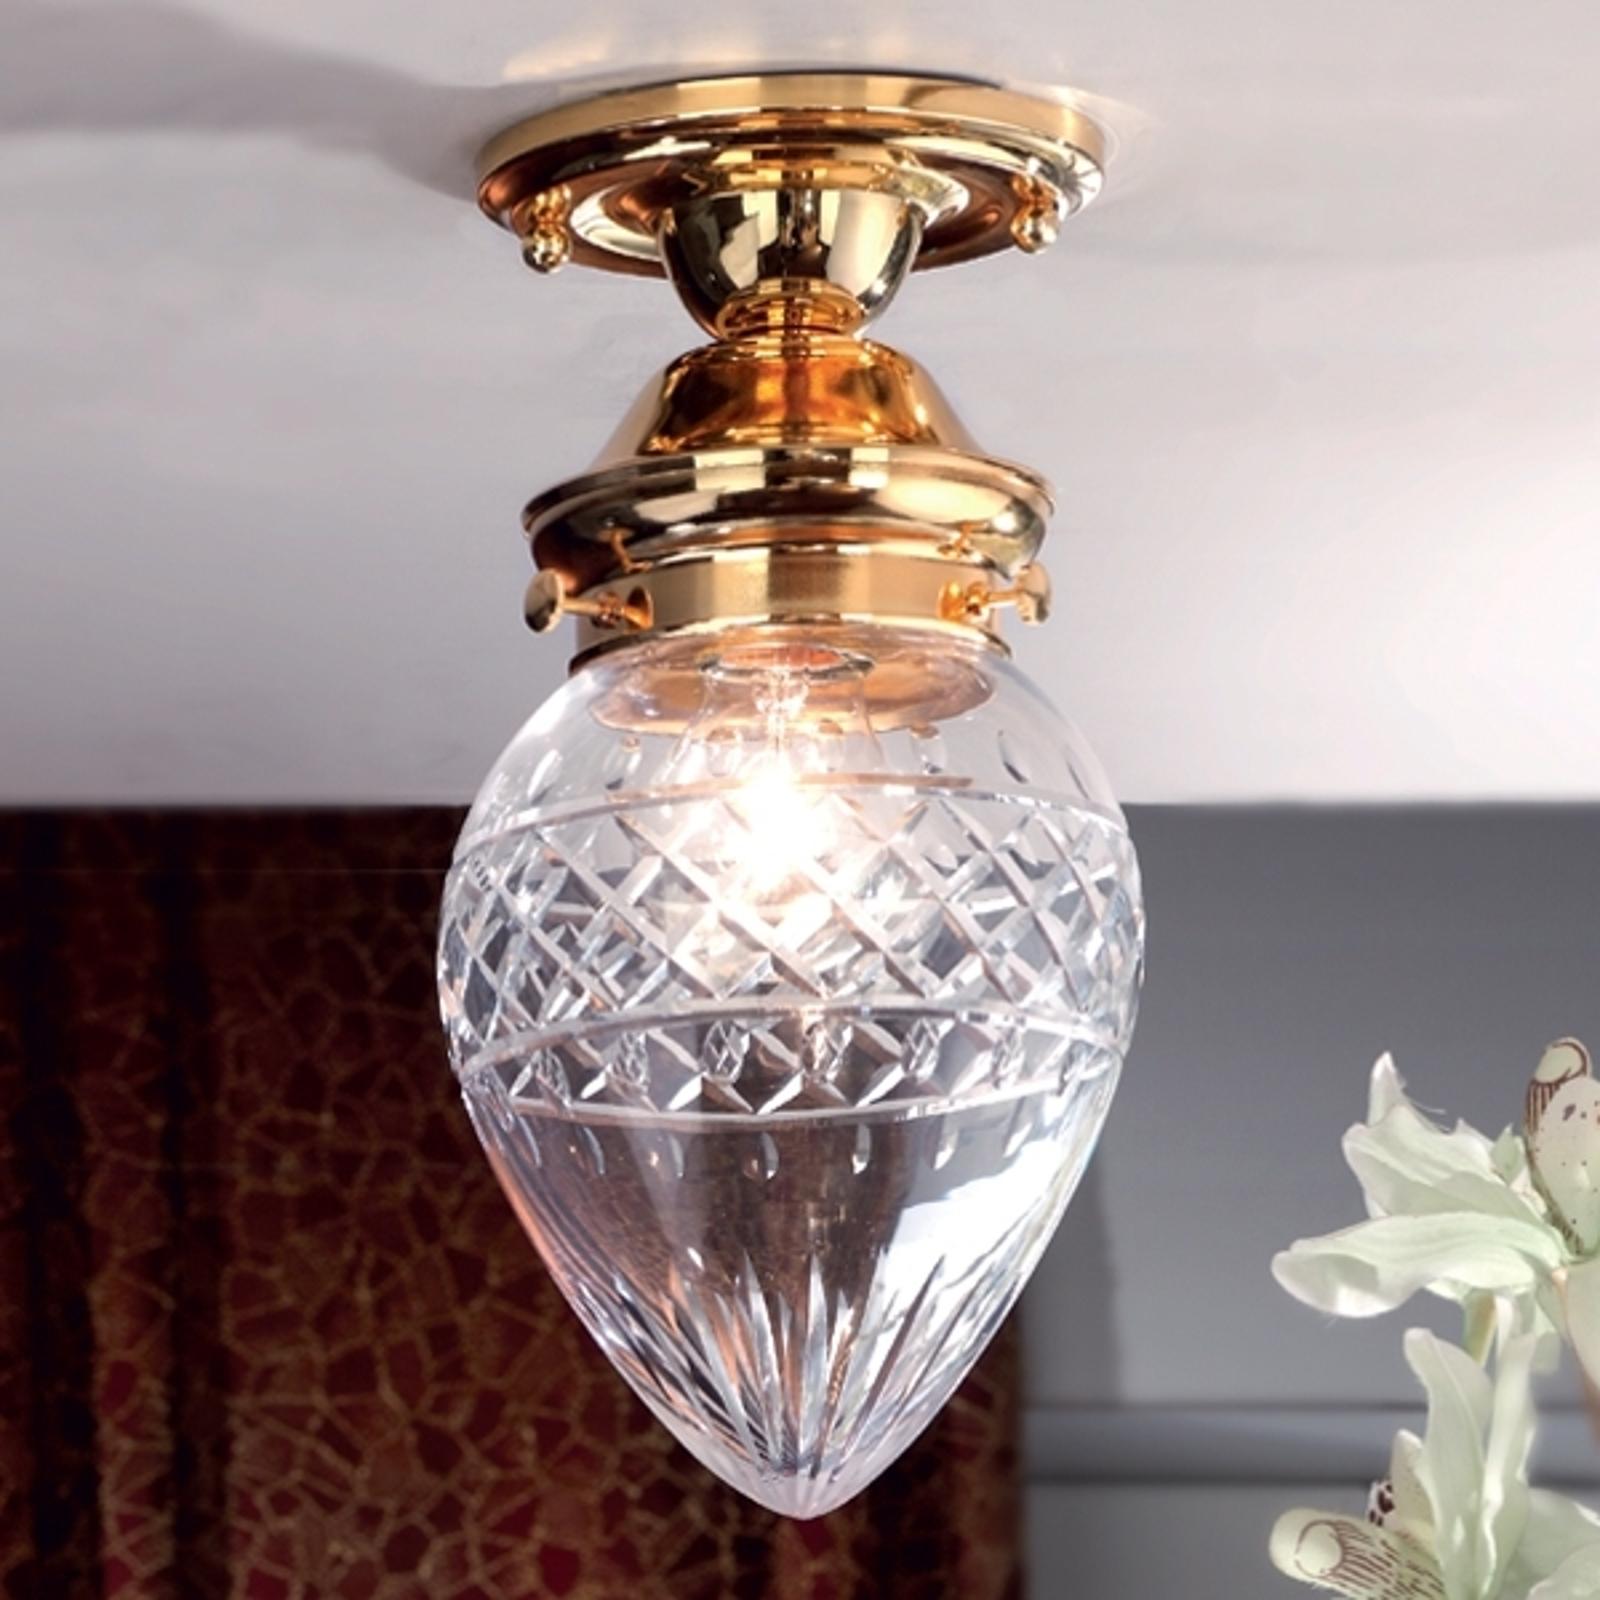 Kelkvormige plafondlamp BUDAPEST, diameter 15 cm